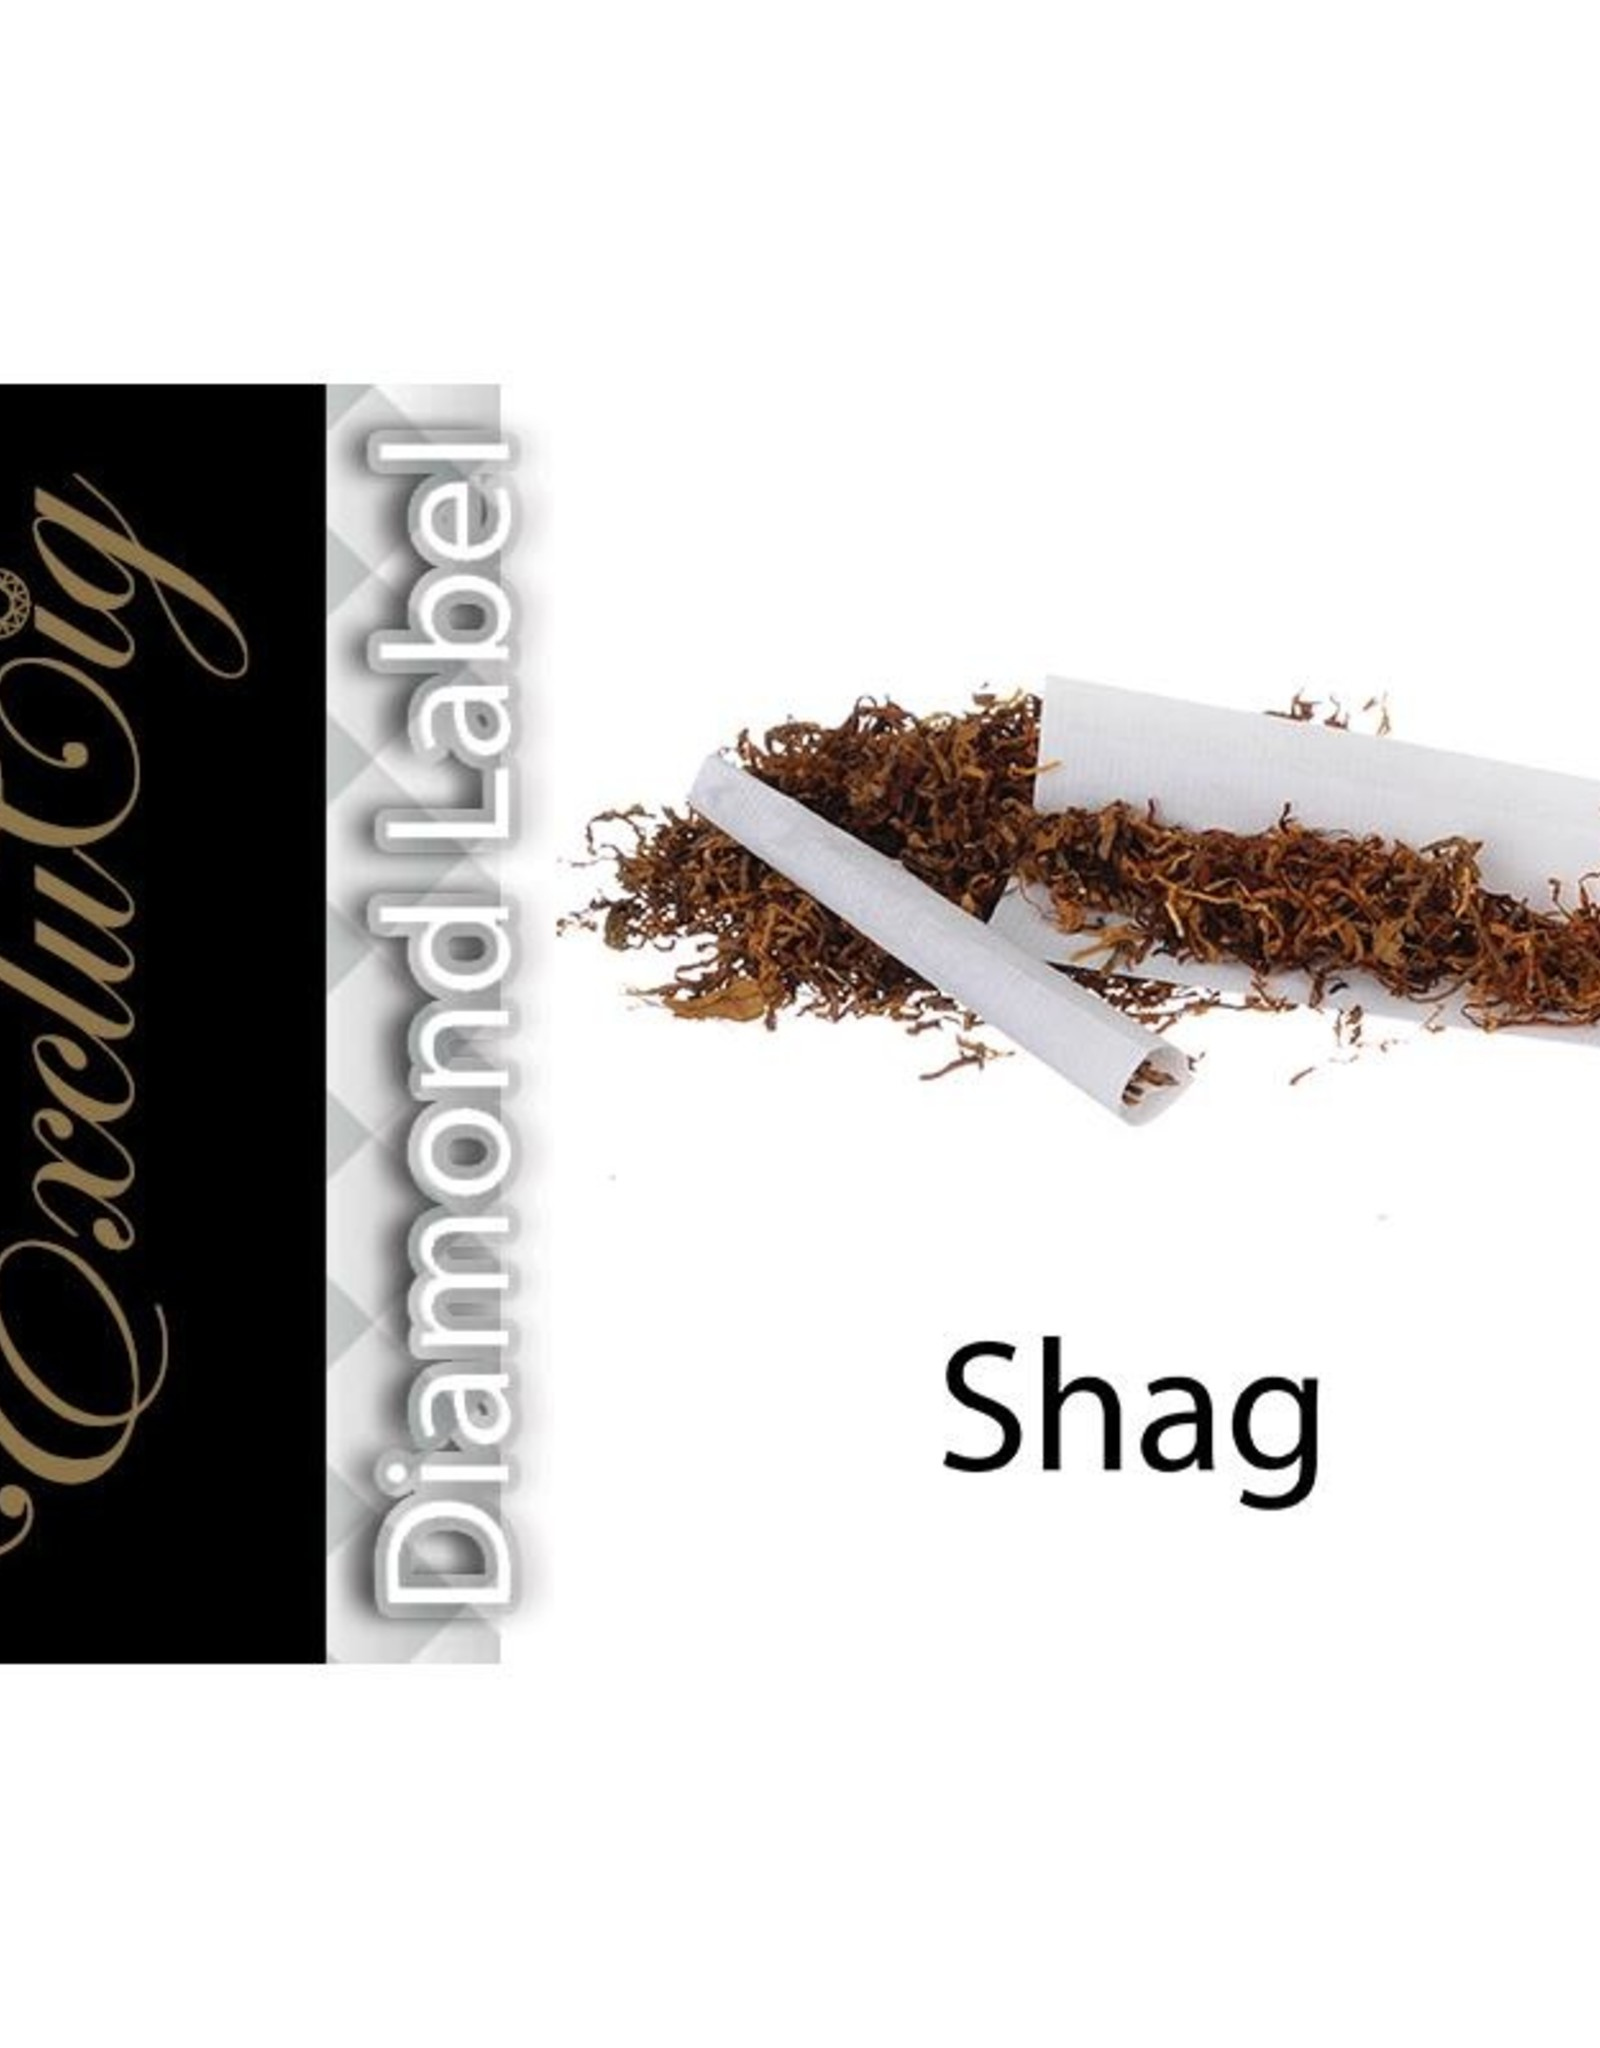 Exclucig Exclucig Diamond Label E-liquid Shag 12 mg Nicotine